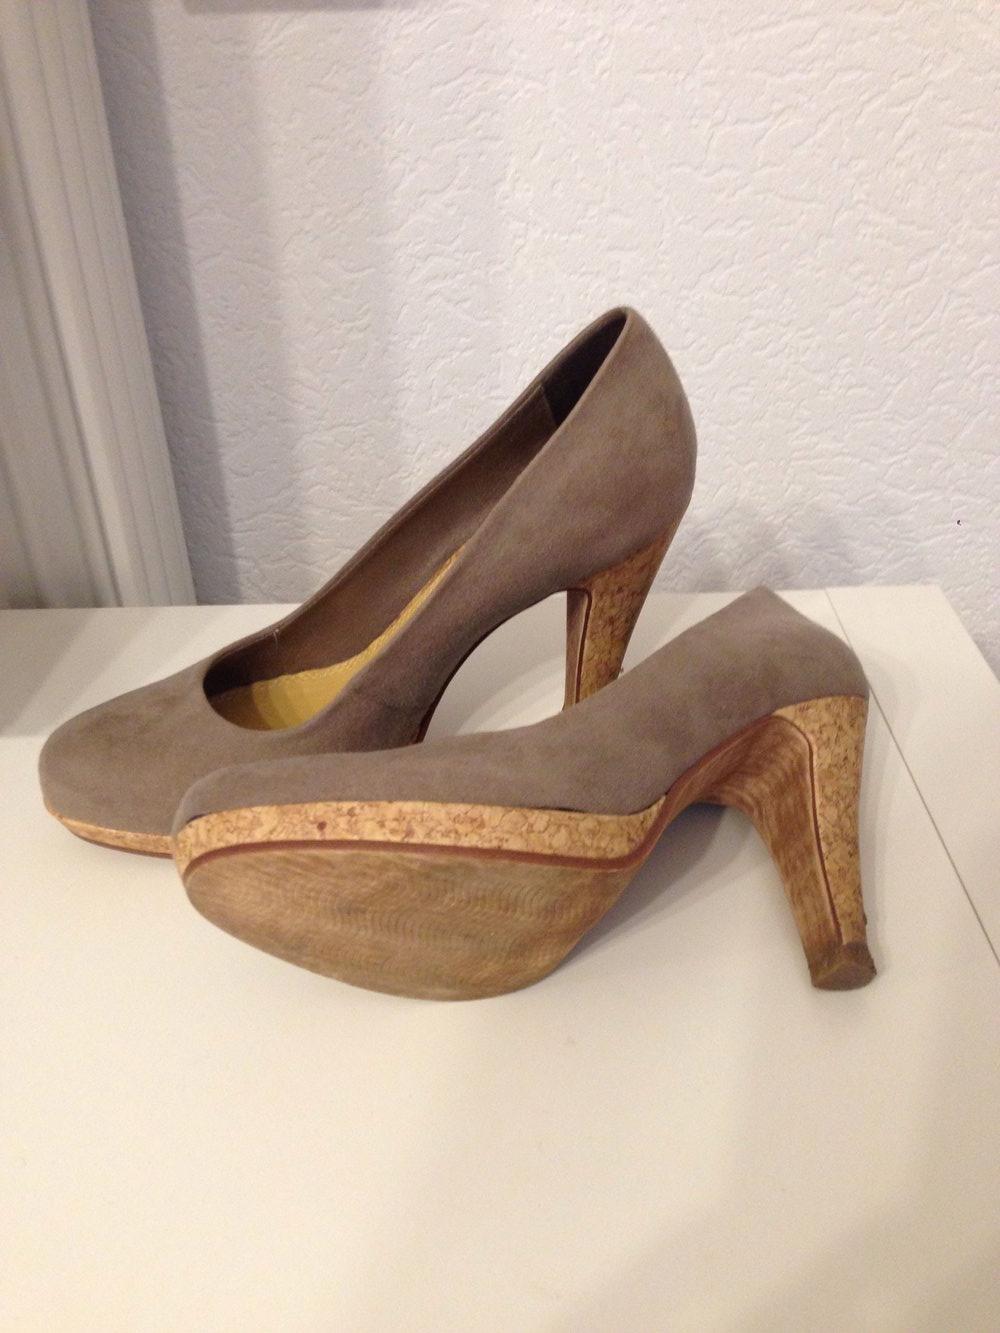 bpc wildlederimitat high heels mit korkabsatz. Black Bedroom Furniture Sets. Home Design Ideas